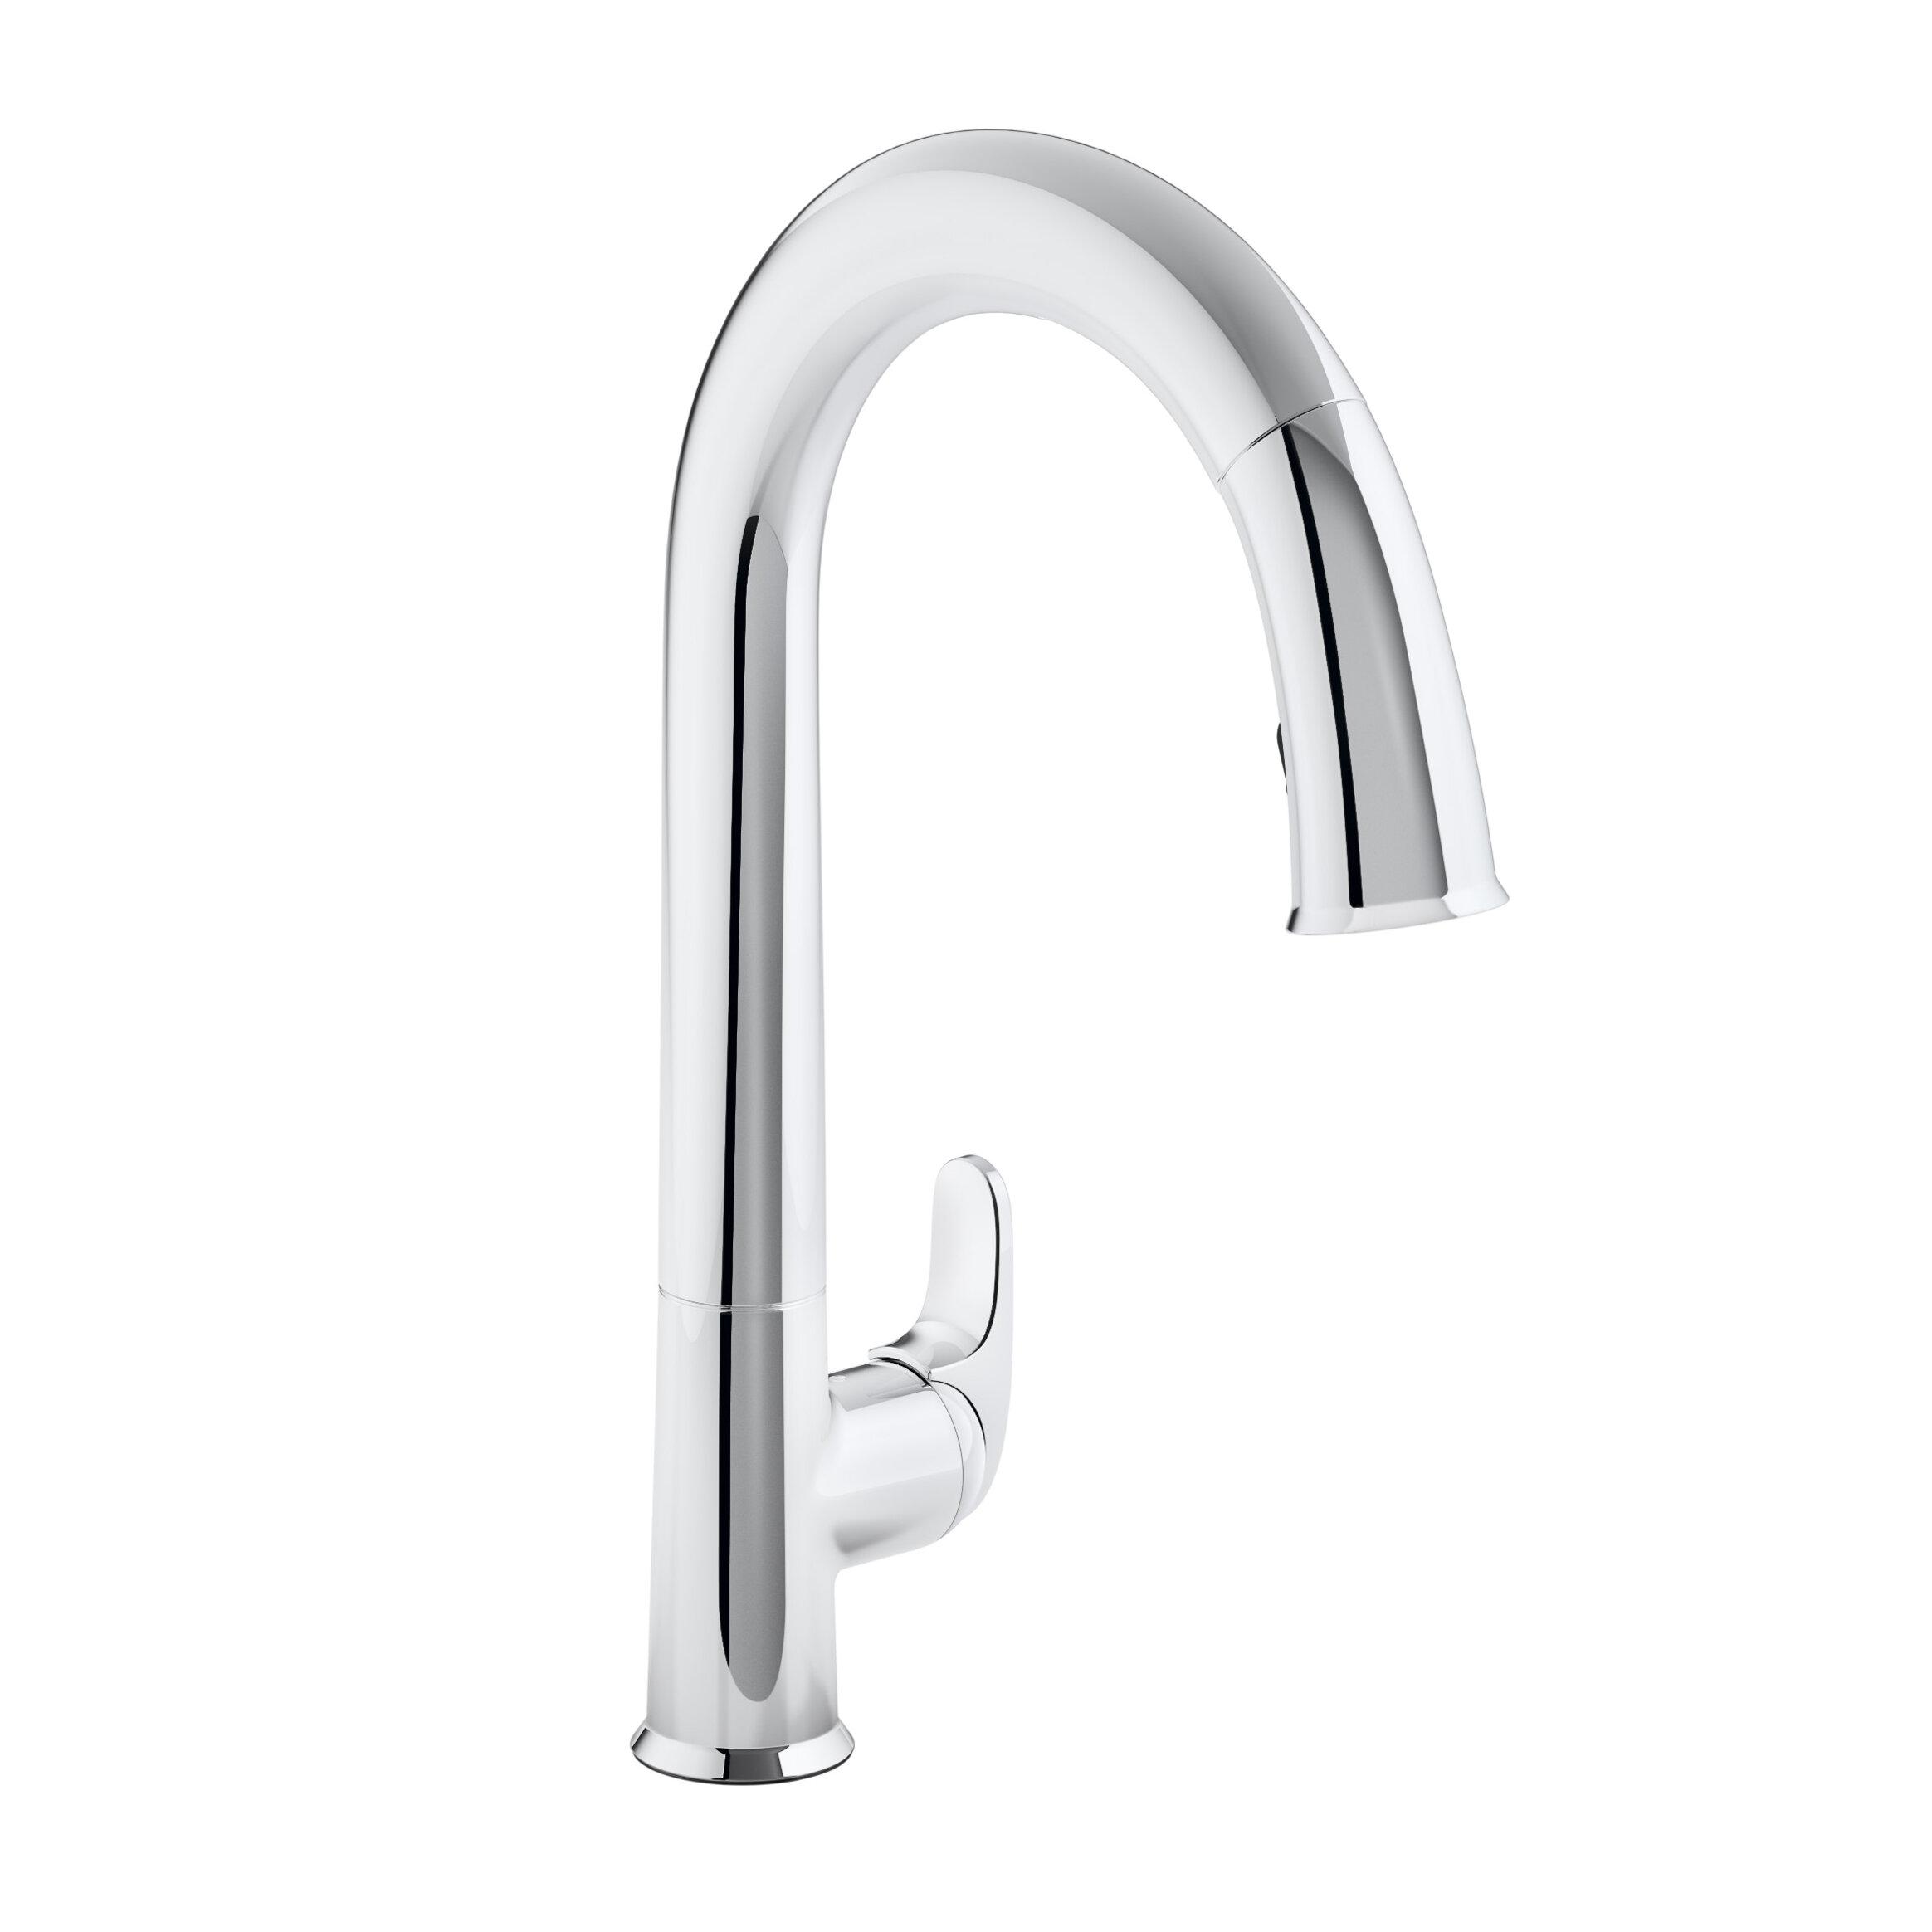 brass of size touchless bathroom photos best gratograt kitchen full contemporary touch large hose sink faucets faucet bridge